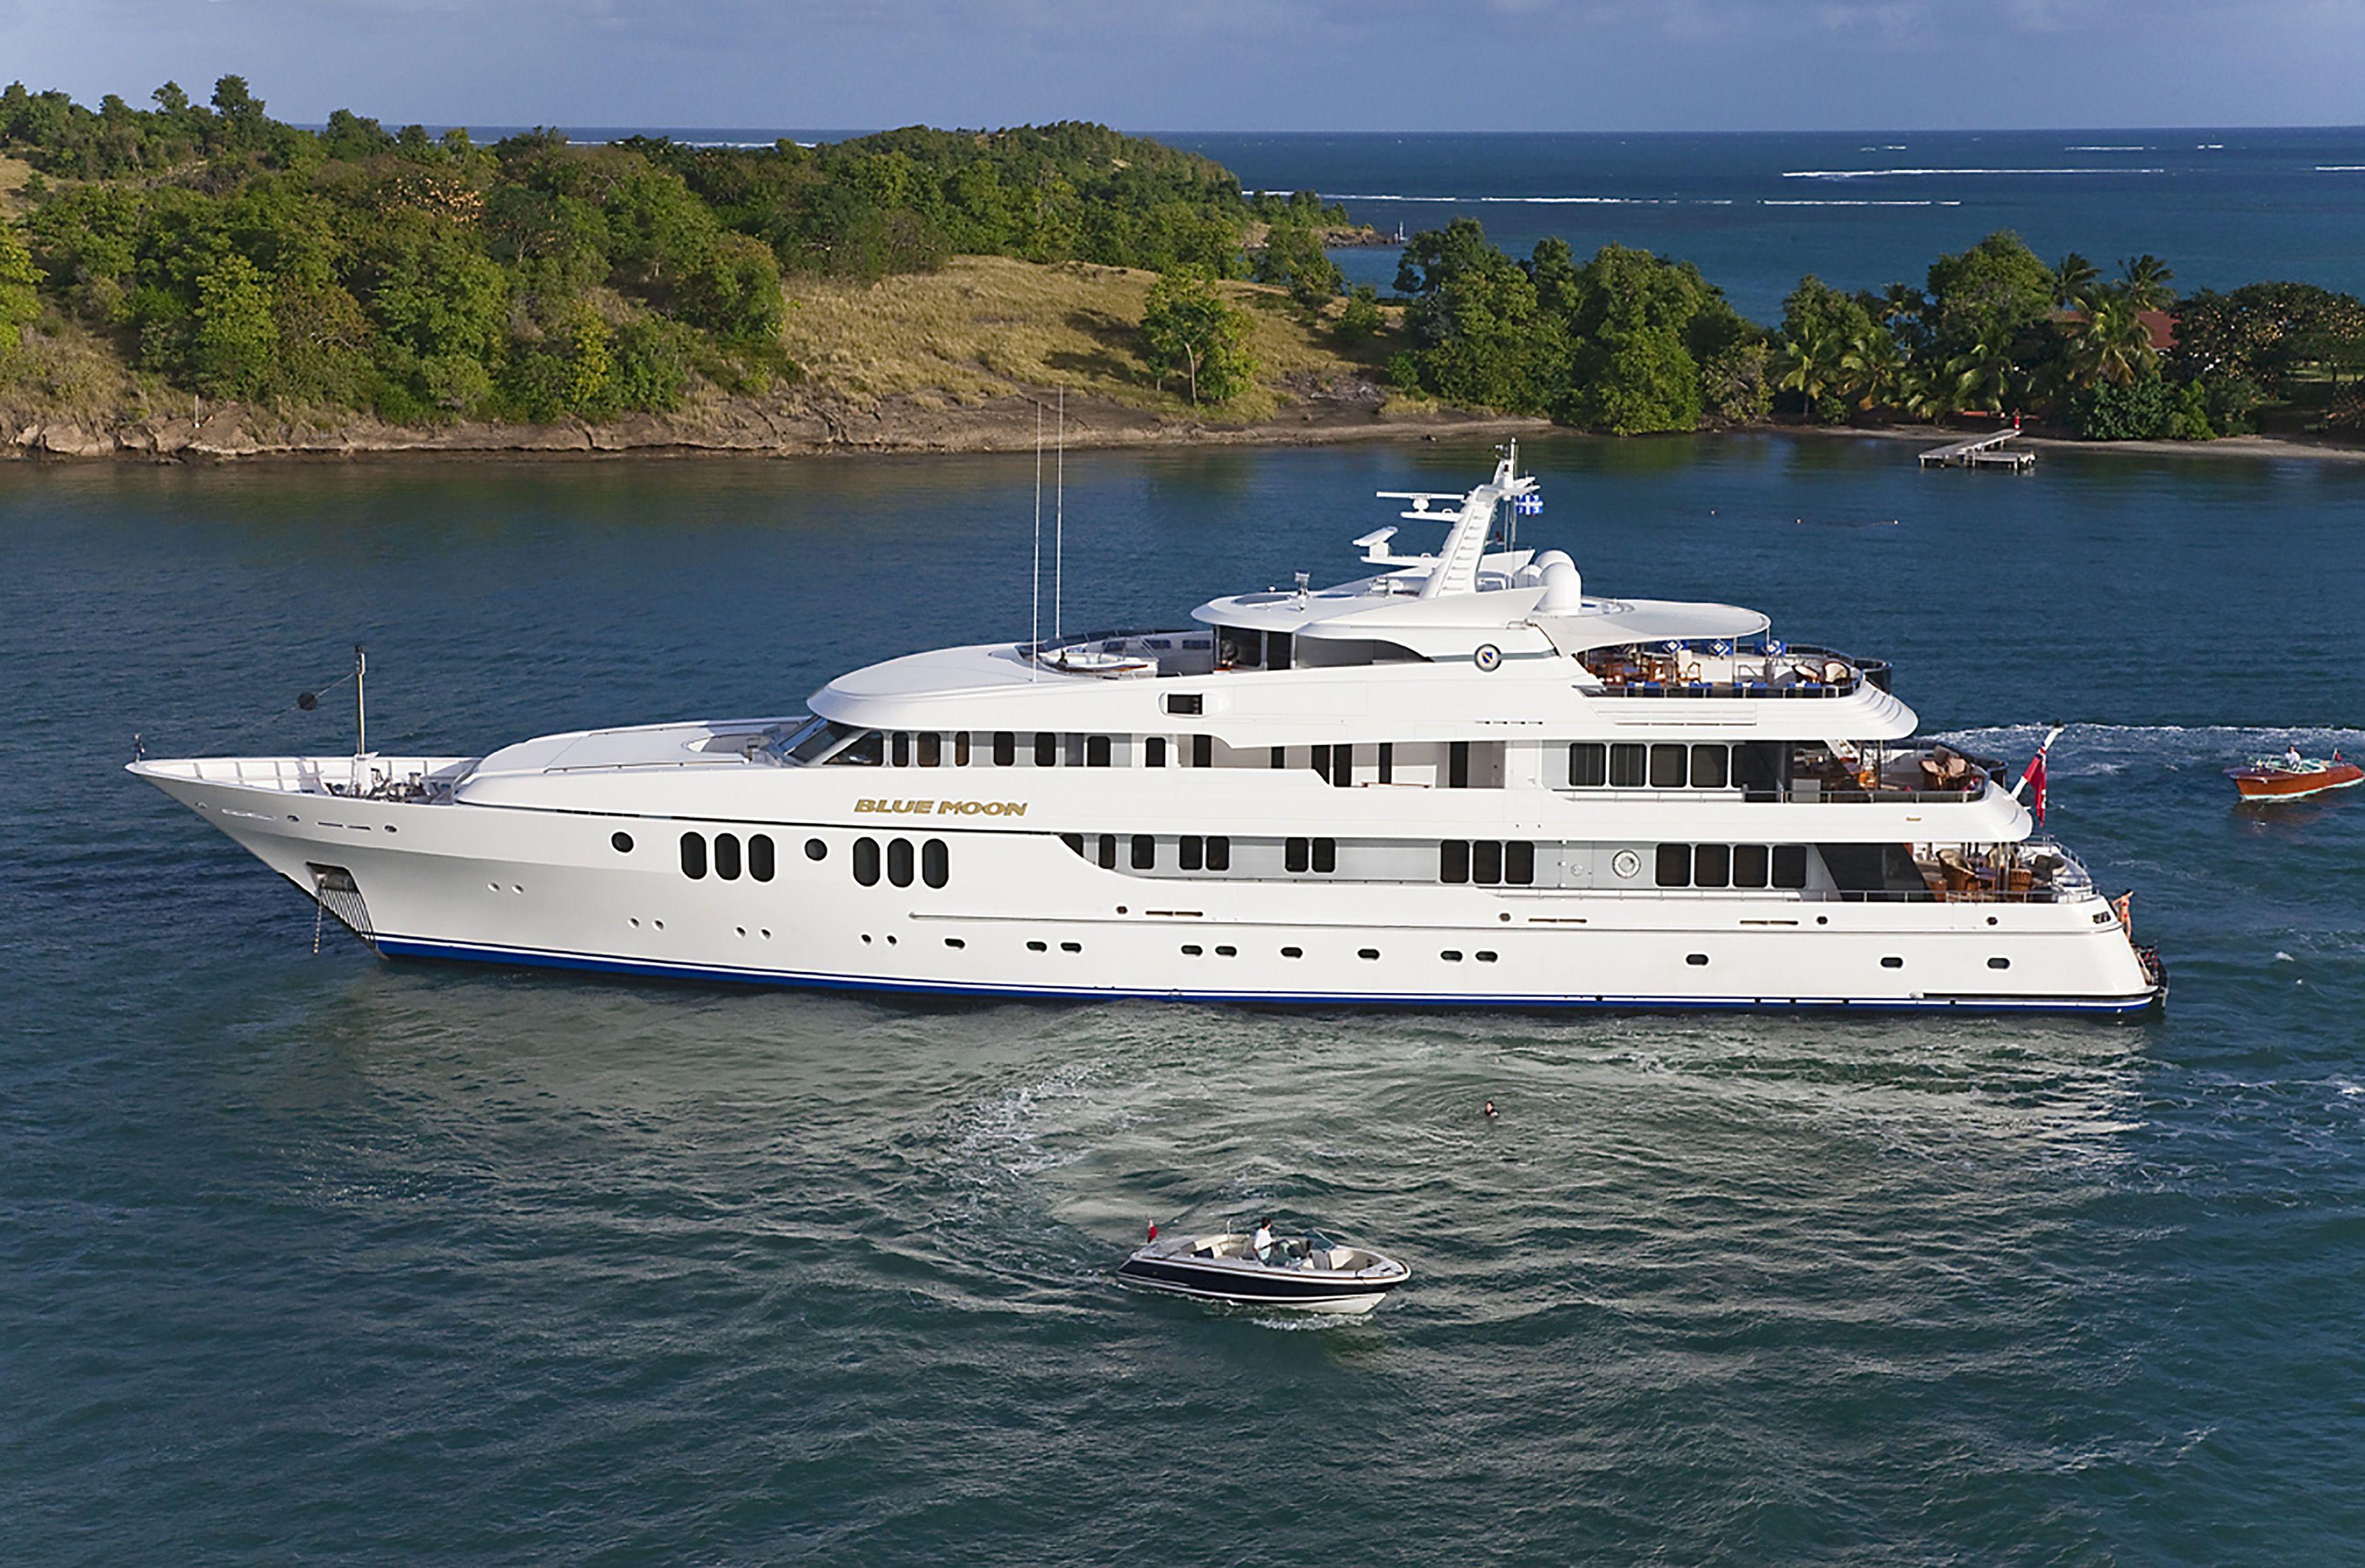 BLUE-MOON-yacht-For-sale-charter-01.jpg